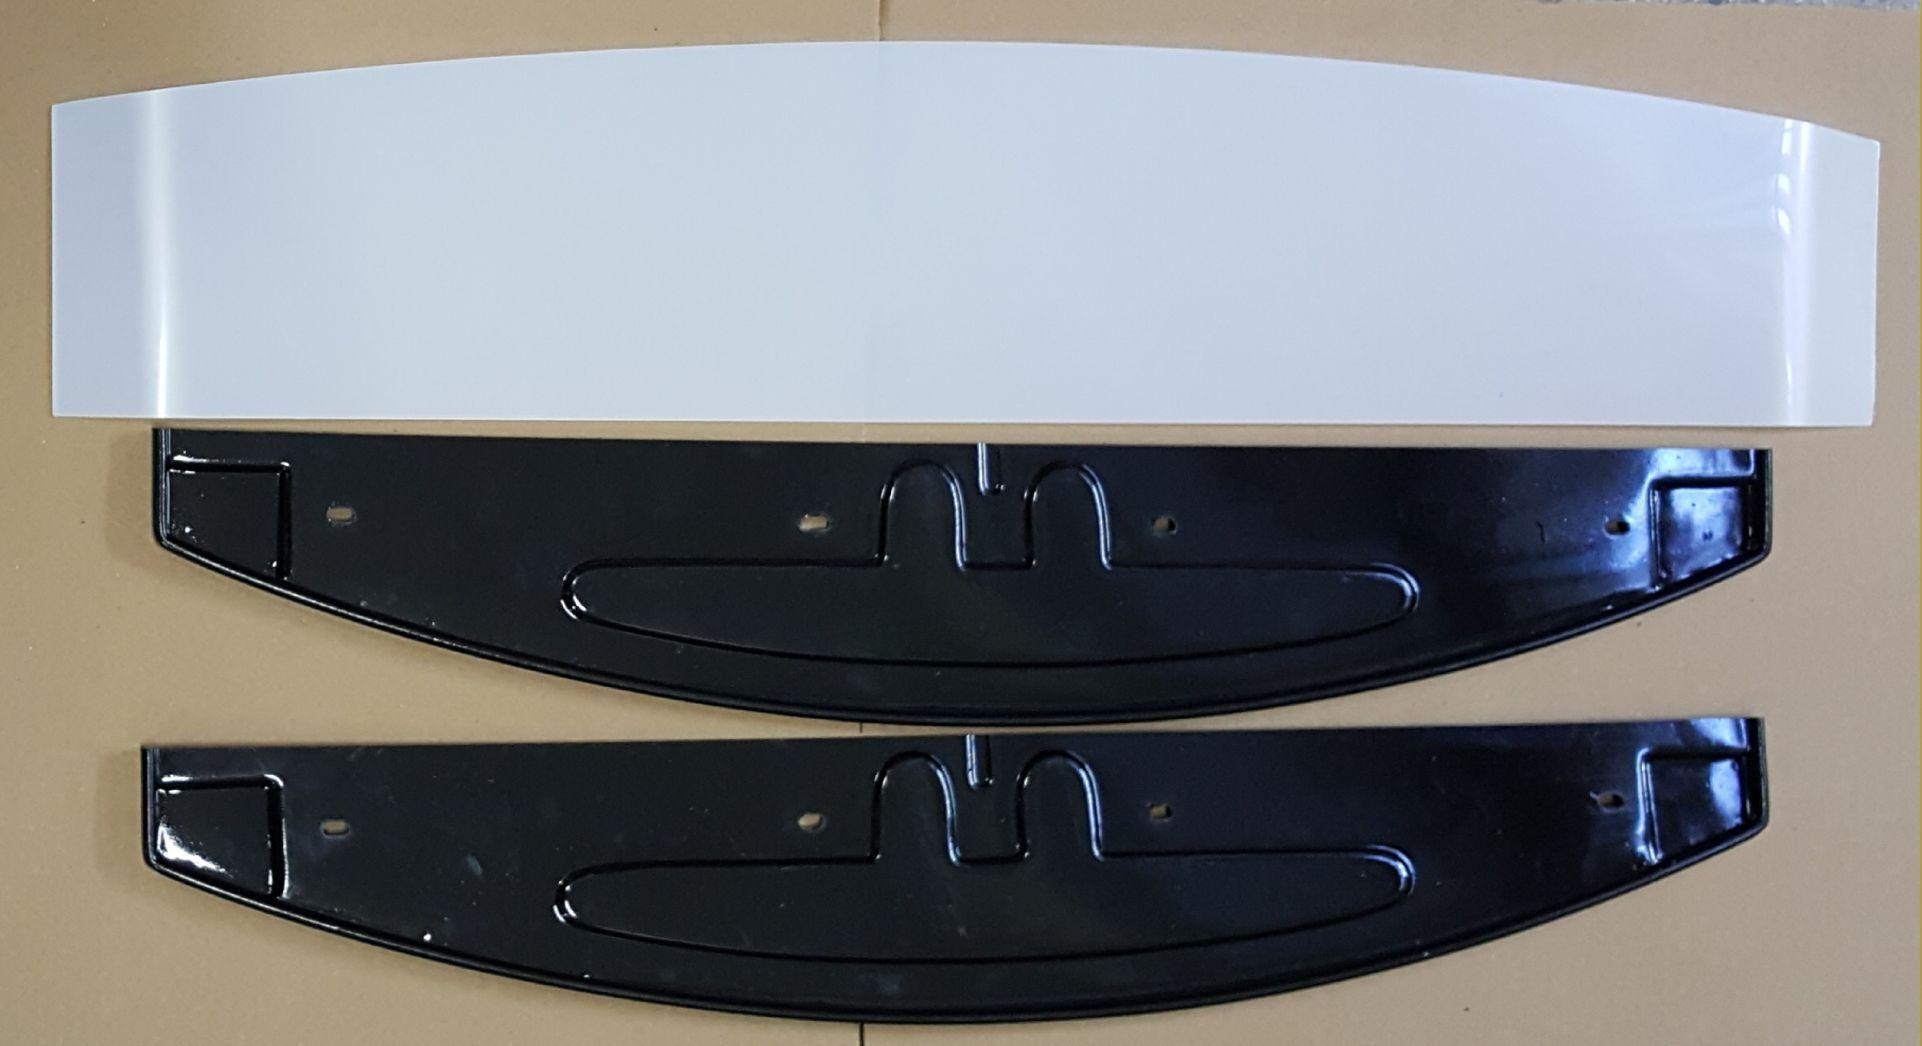 Kit conjunto Testeira e Rodapé Geladeira Expositora Vertical Metalfrio Preto 36X68cm